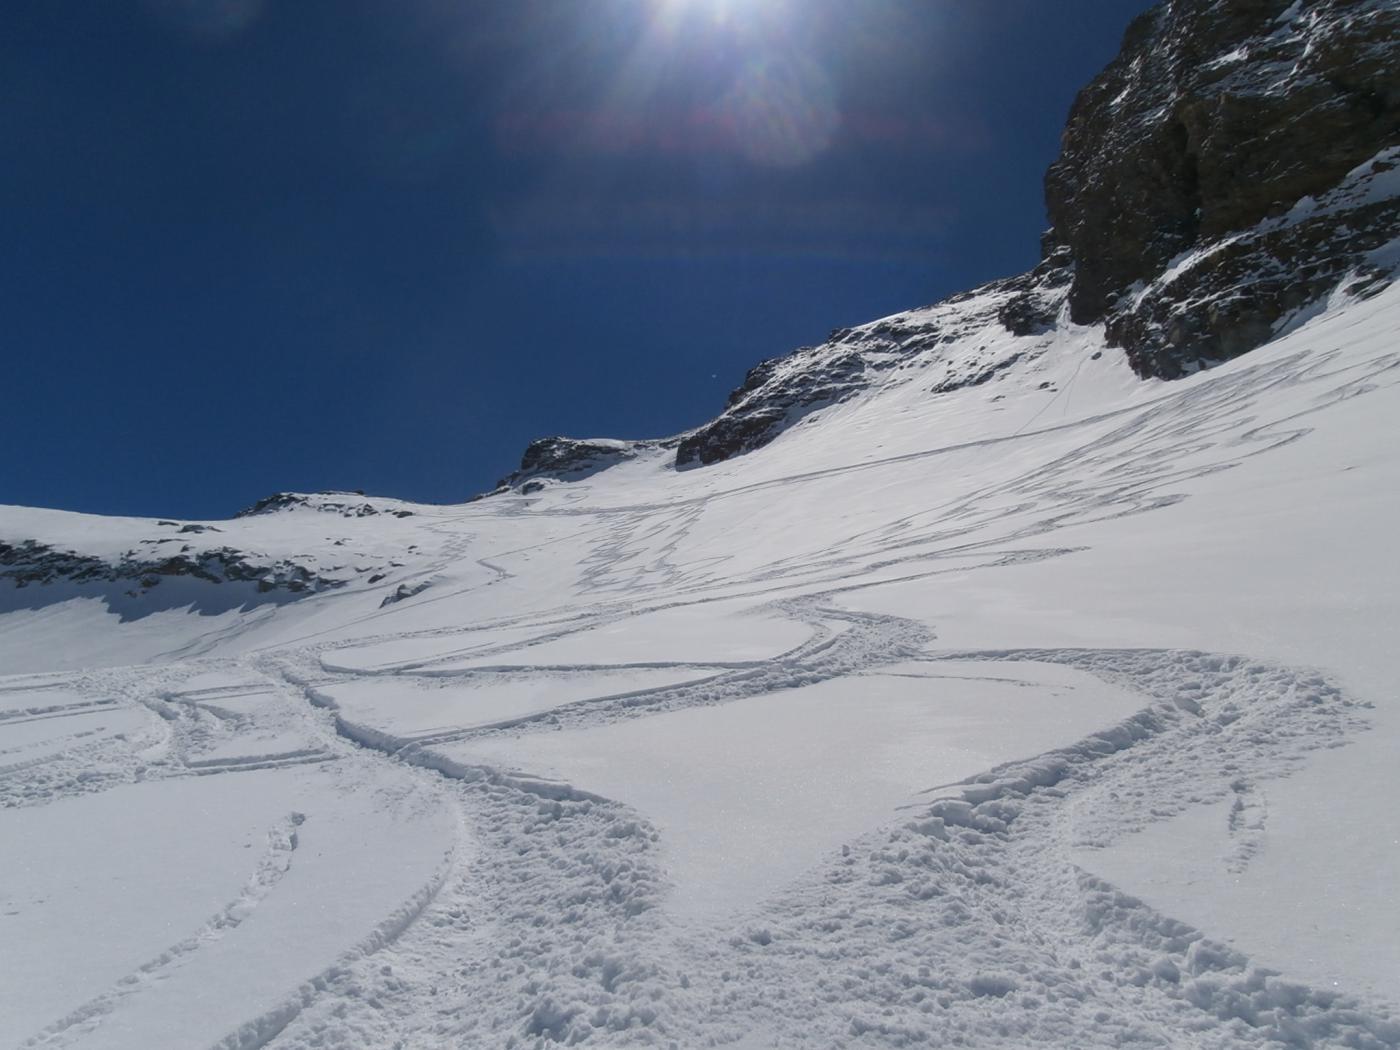 belle curve in discesa  in neve polverosa...